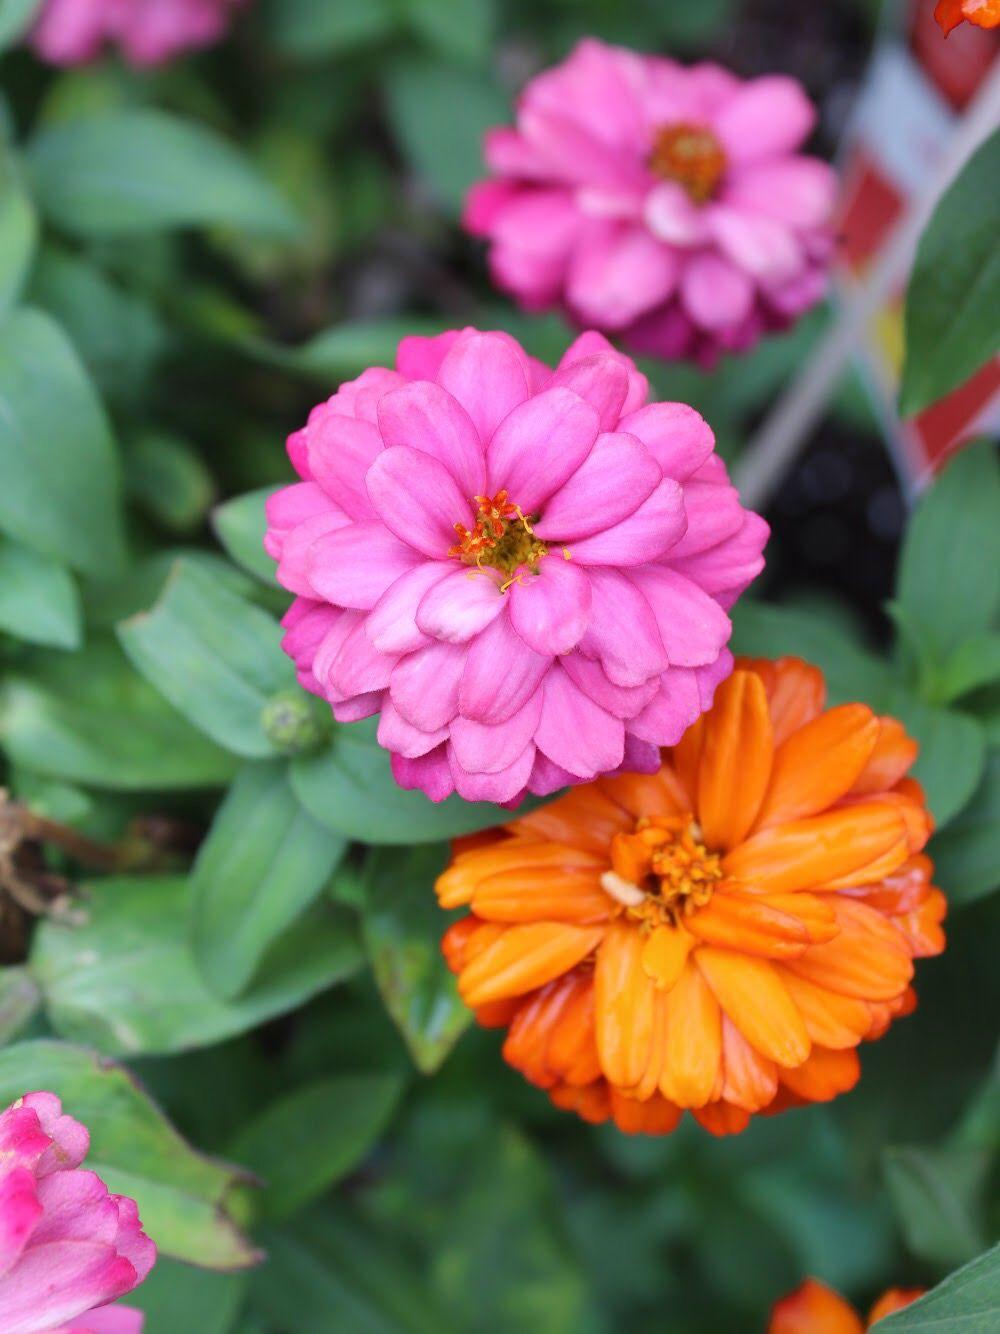 pink flower, orange flower, nature, scenery, DSLR